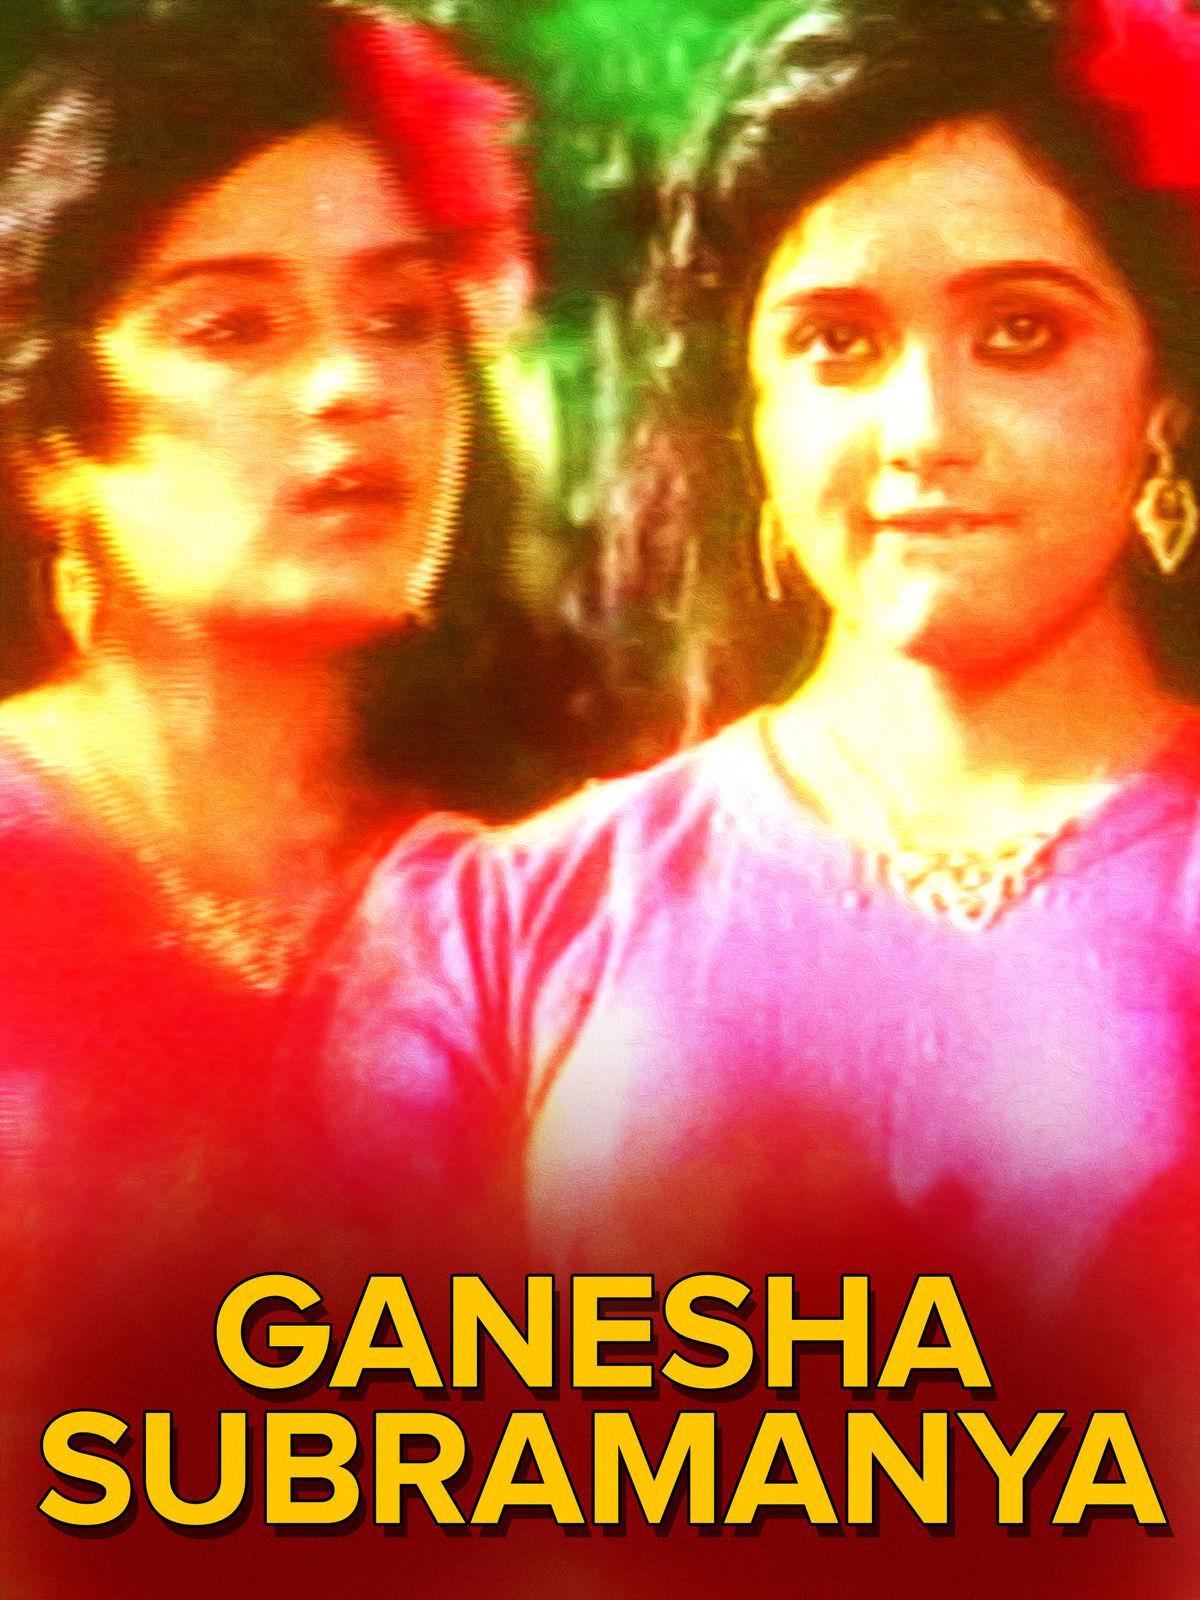 Ganesha Subramanya